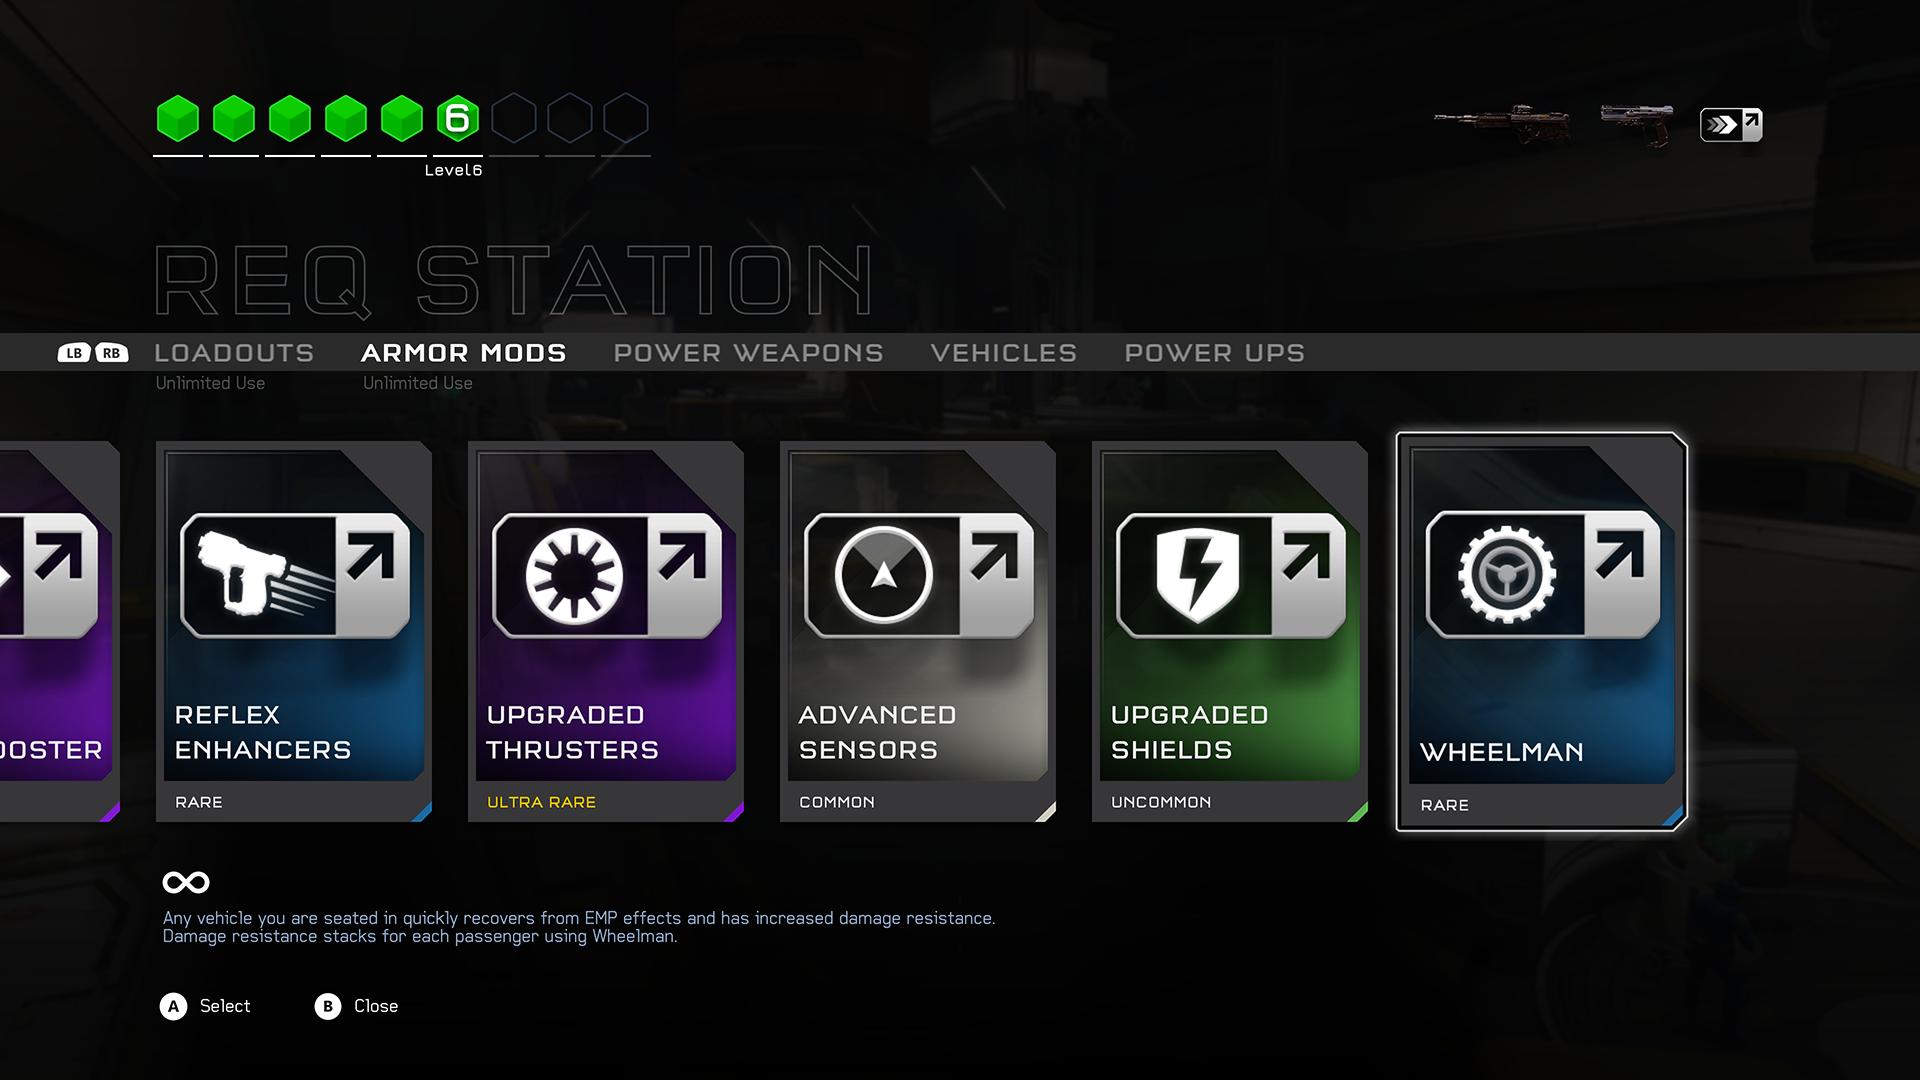 Halo 5: Guardians multiplayer armor mod selection screenshot